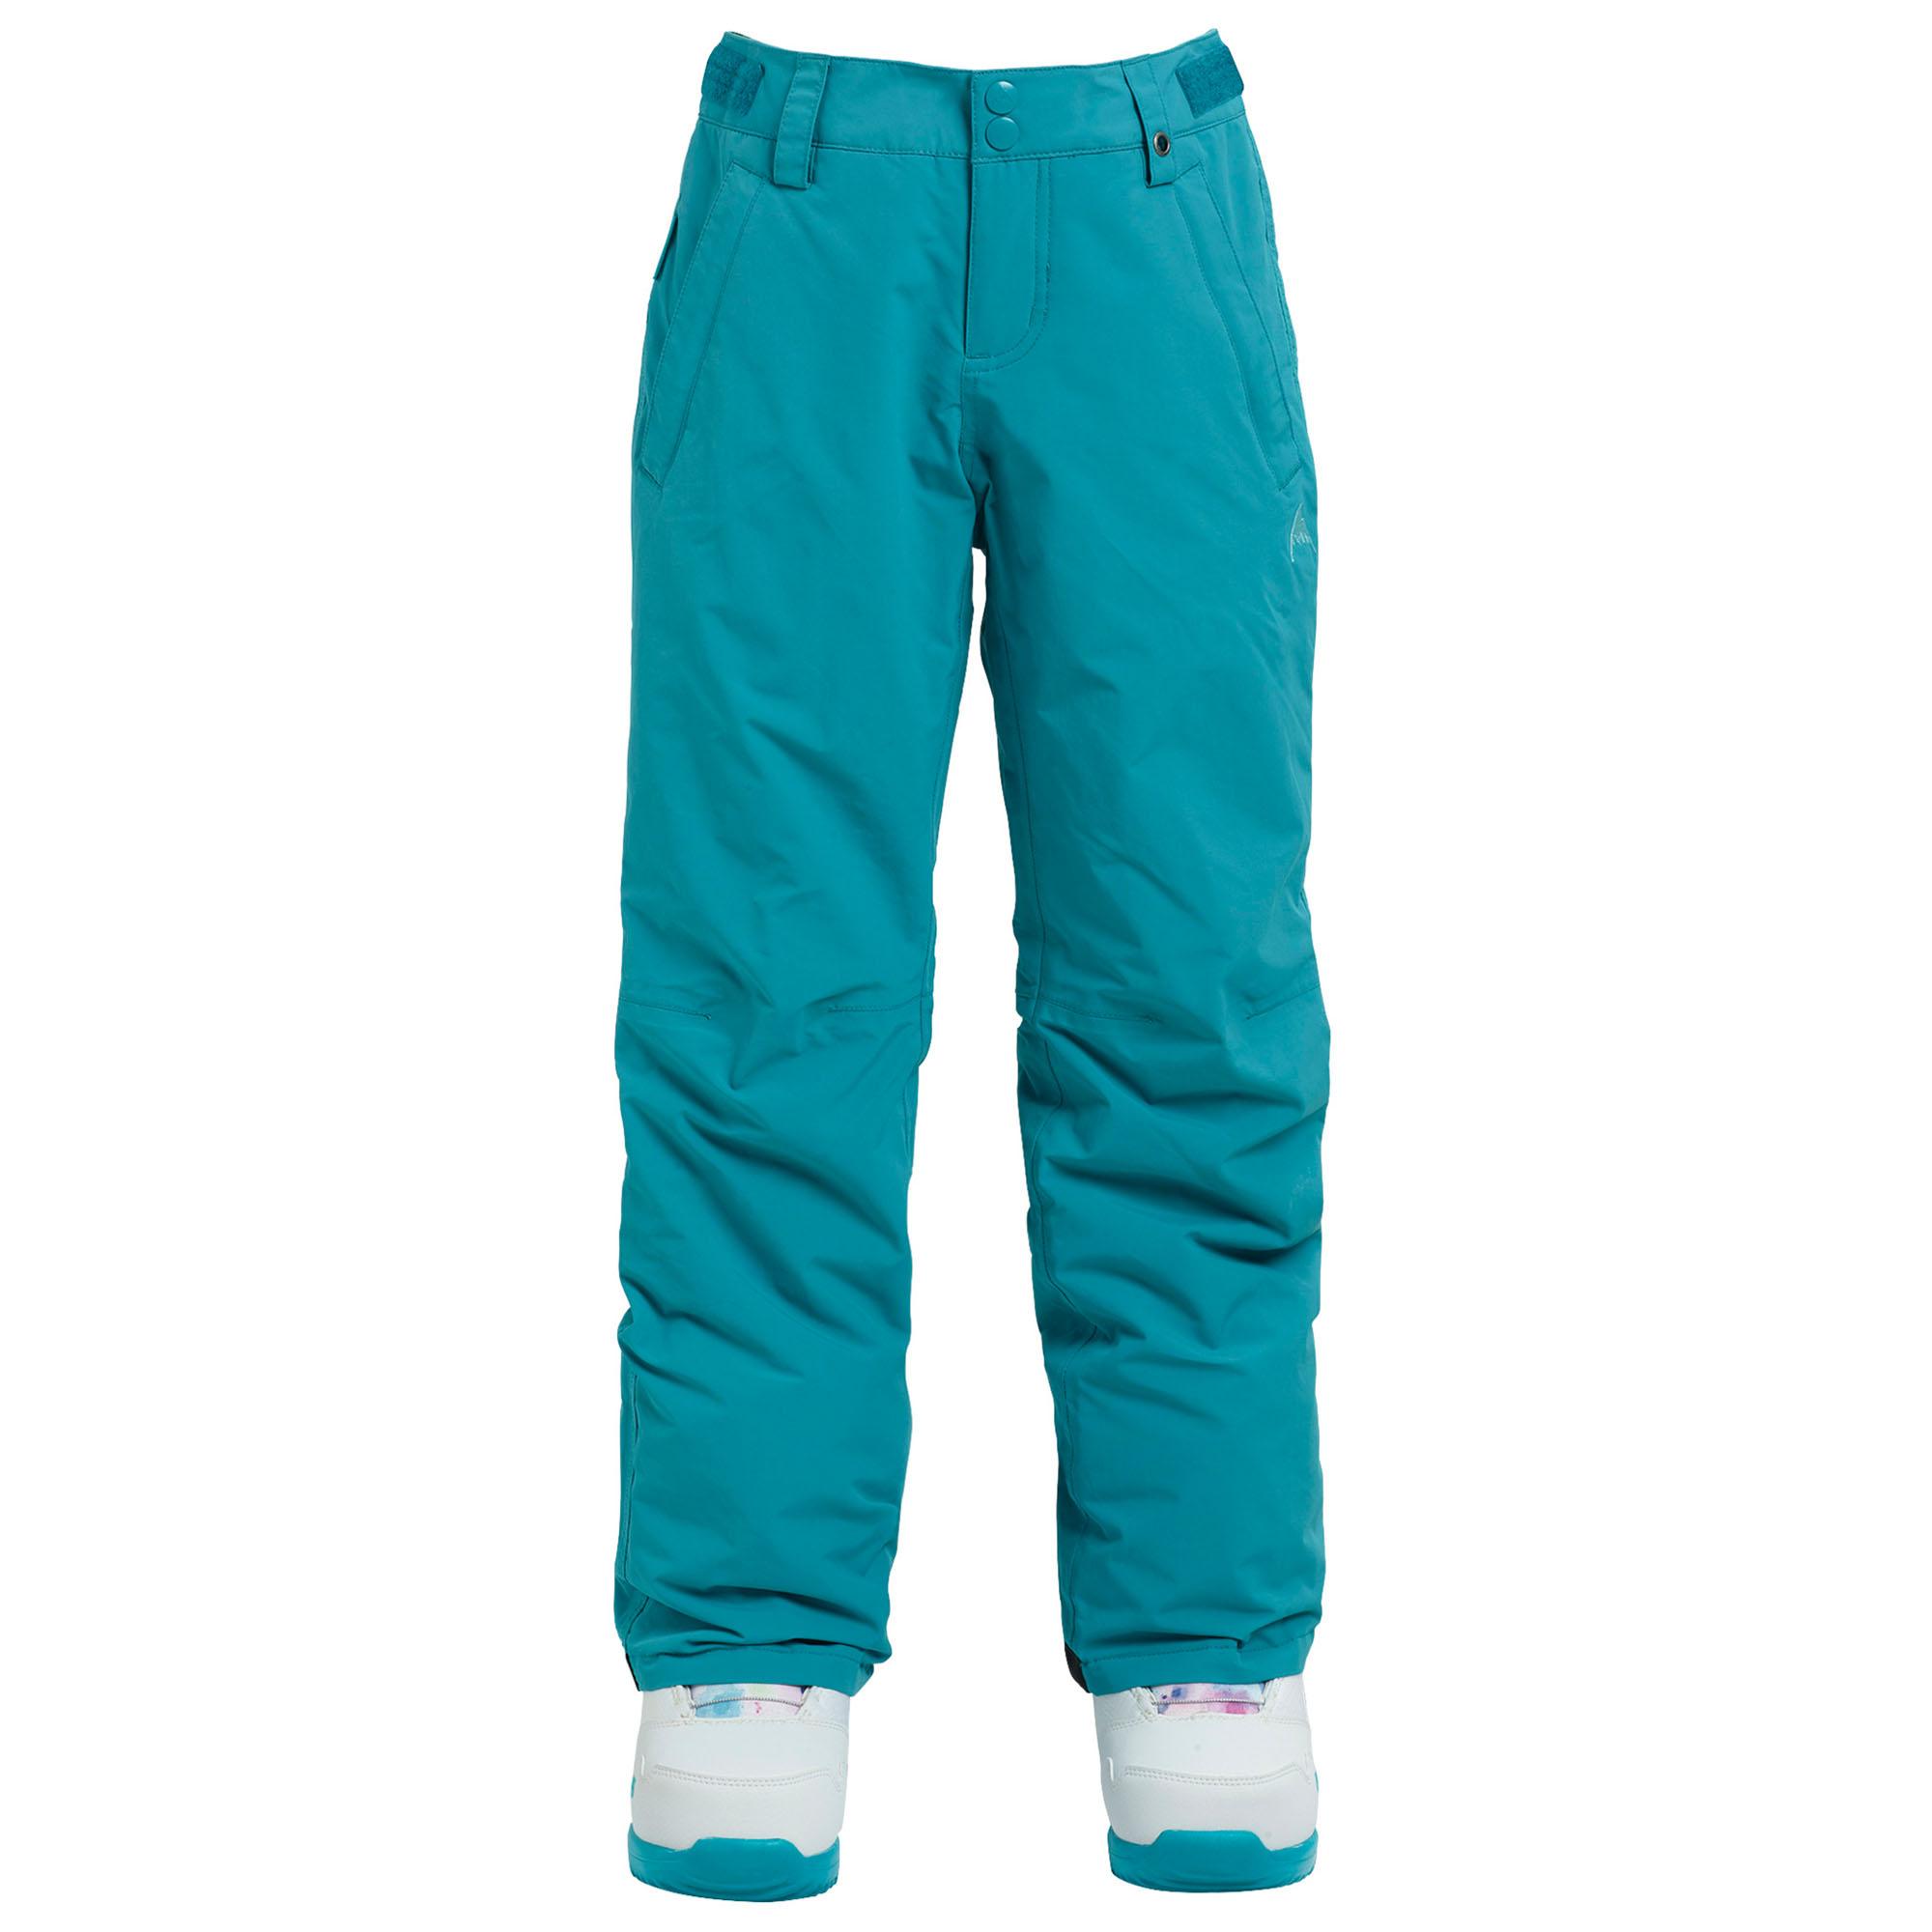 Didriksons Brandon Youth Ski /& Board Pants Salopettes Girls Boys Snowboard